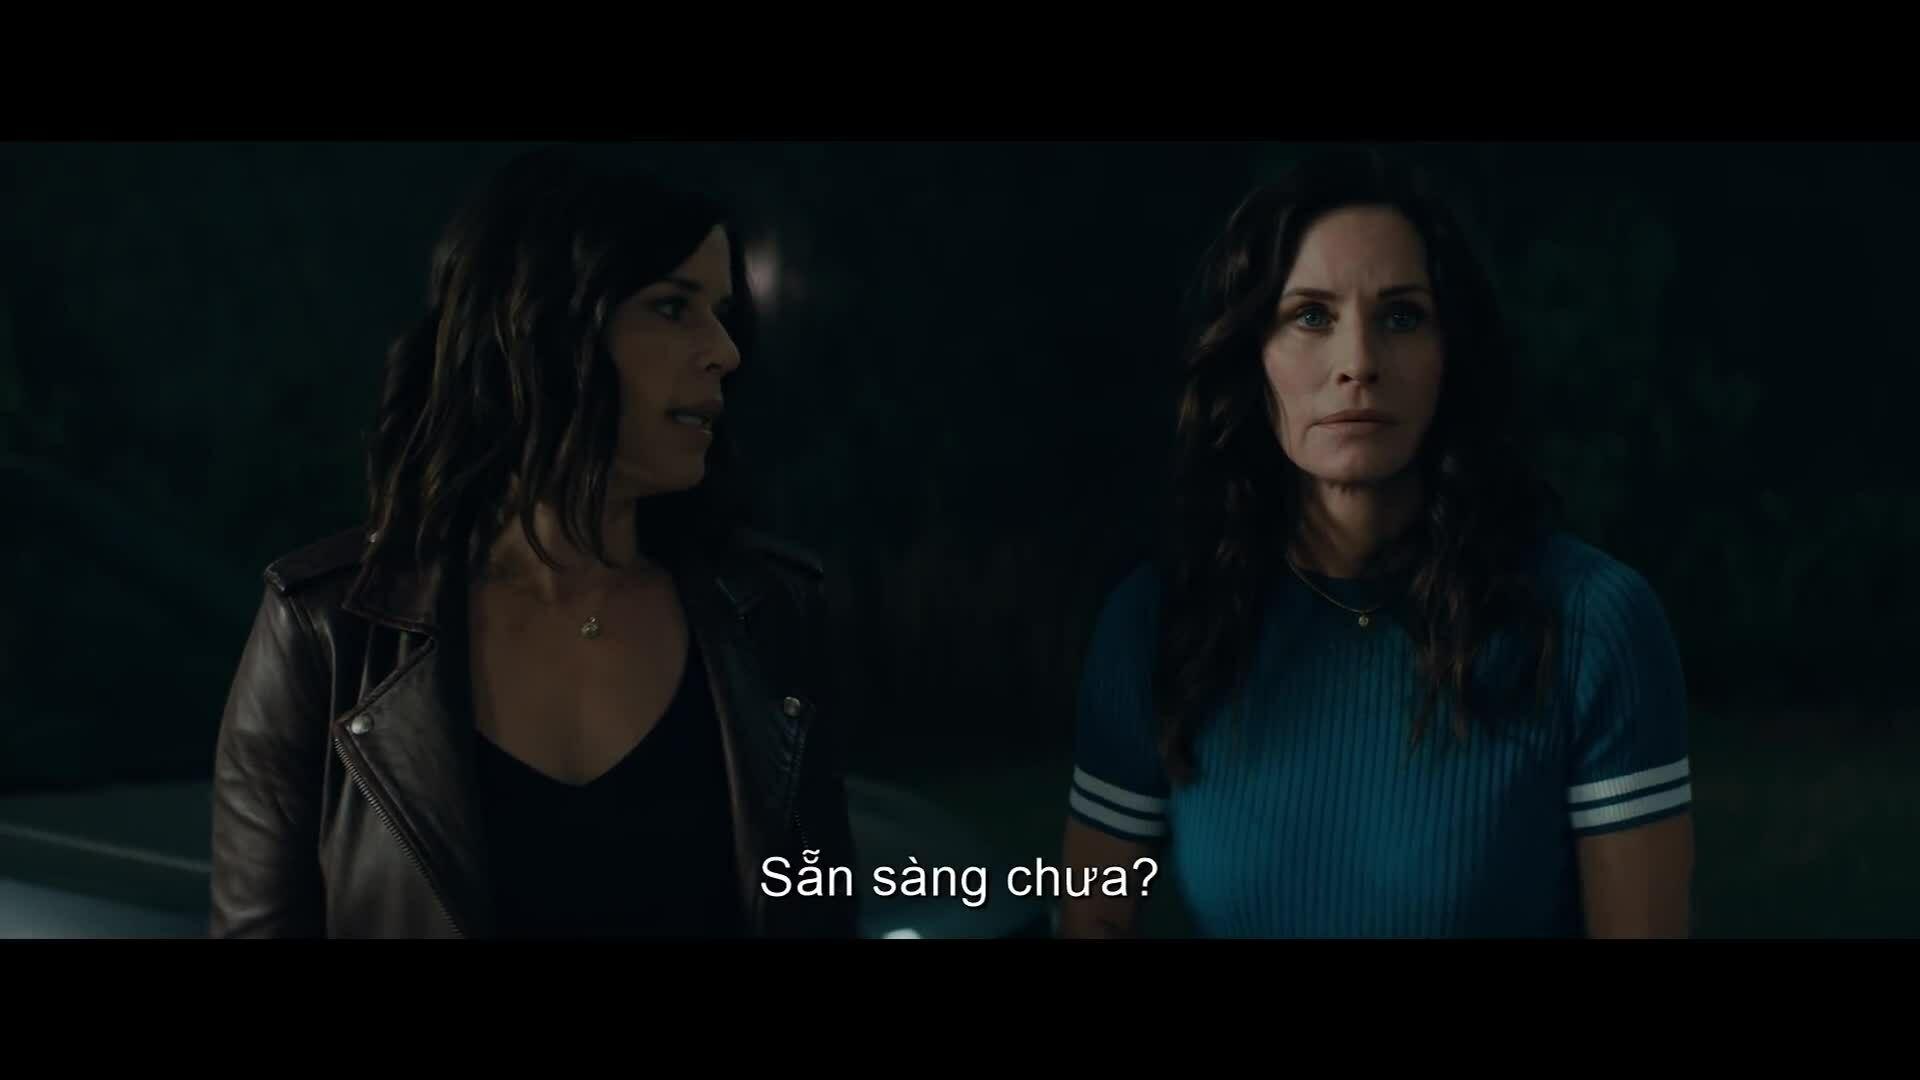 Scream (2022) trailer